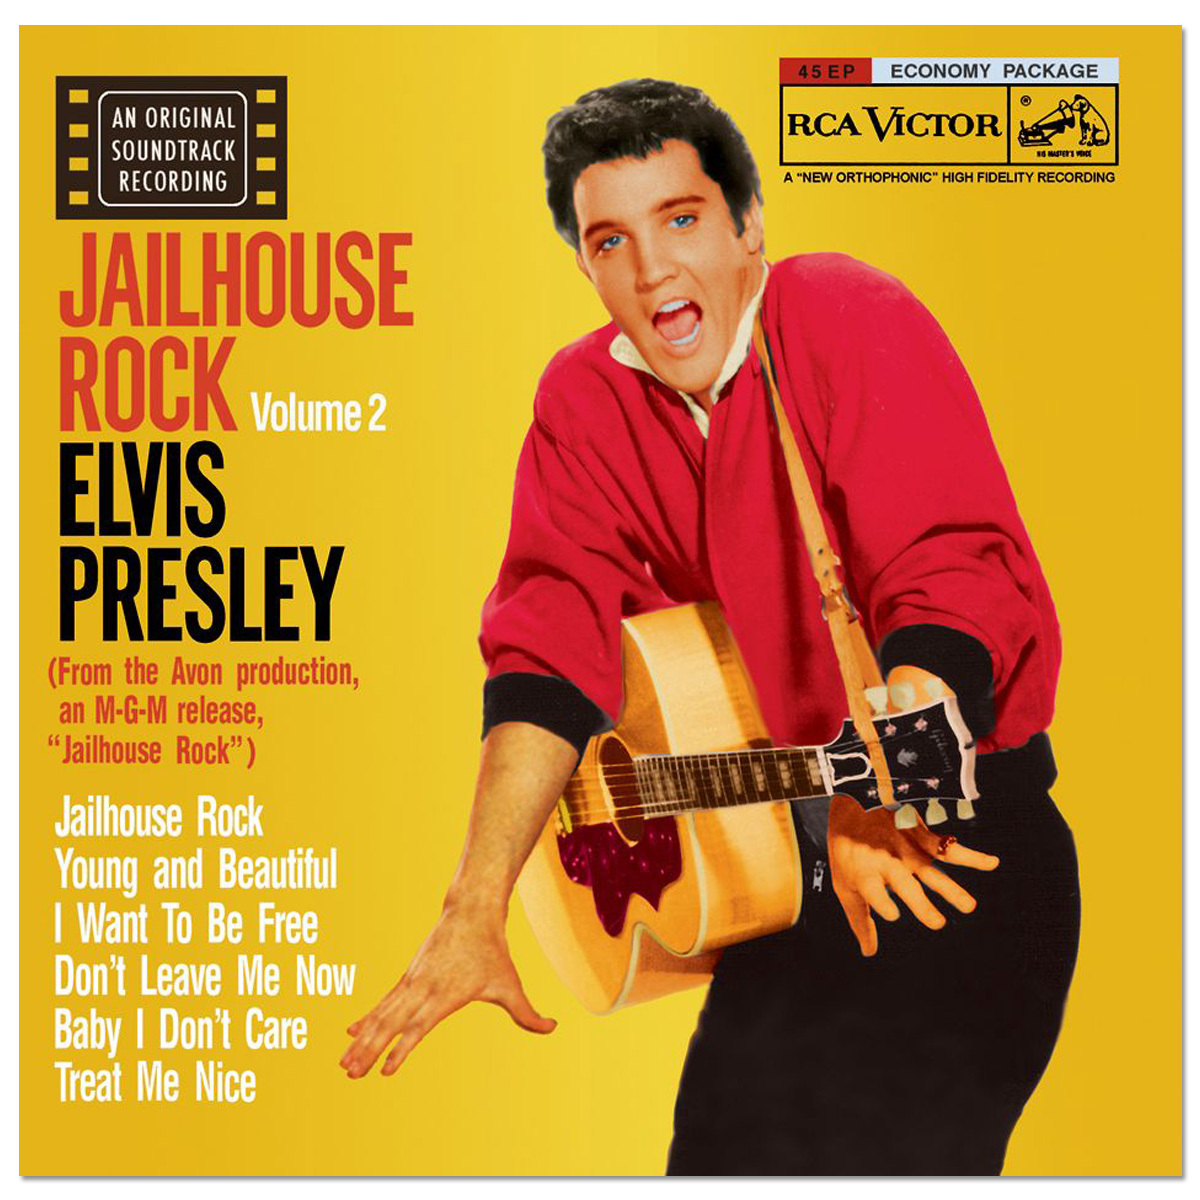 Elvis Jailhouse Rock Vol. 2 FTD CD